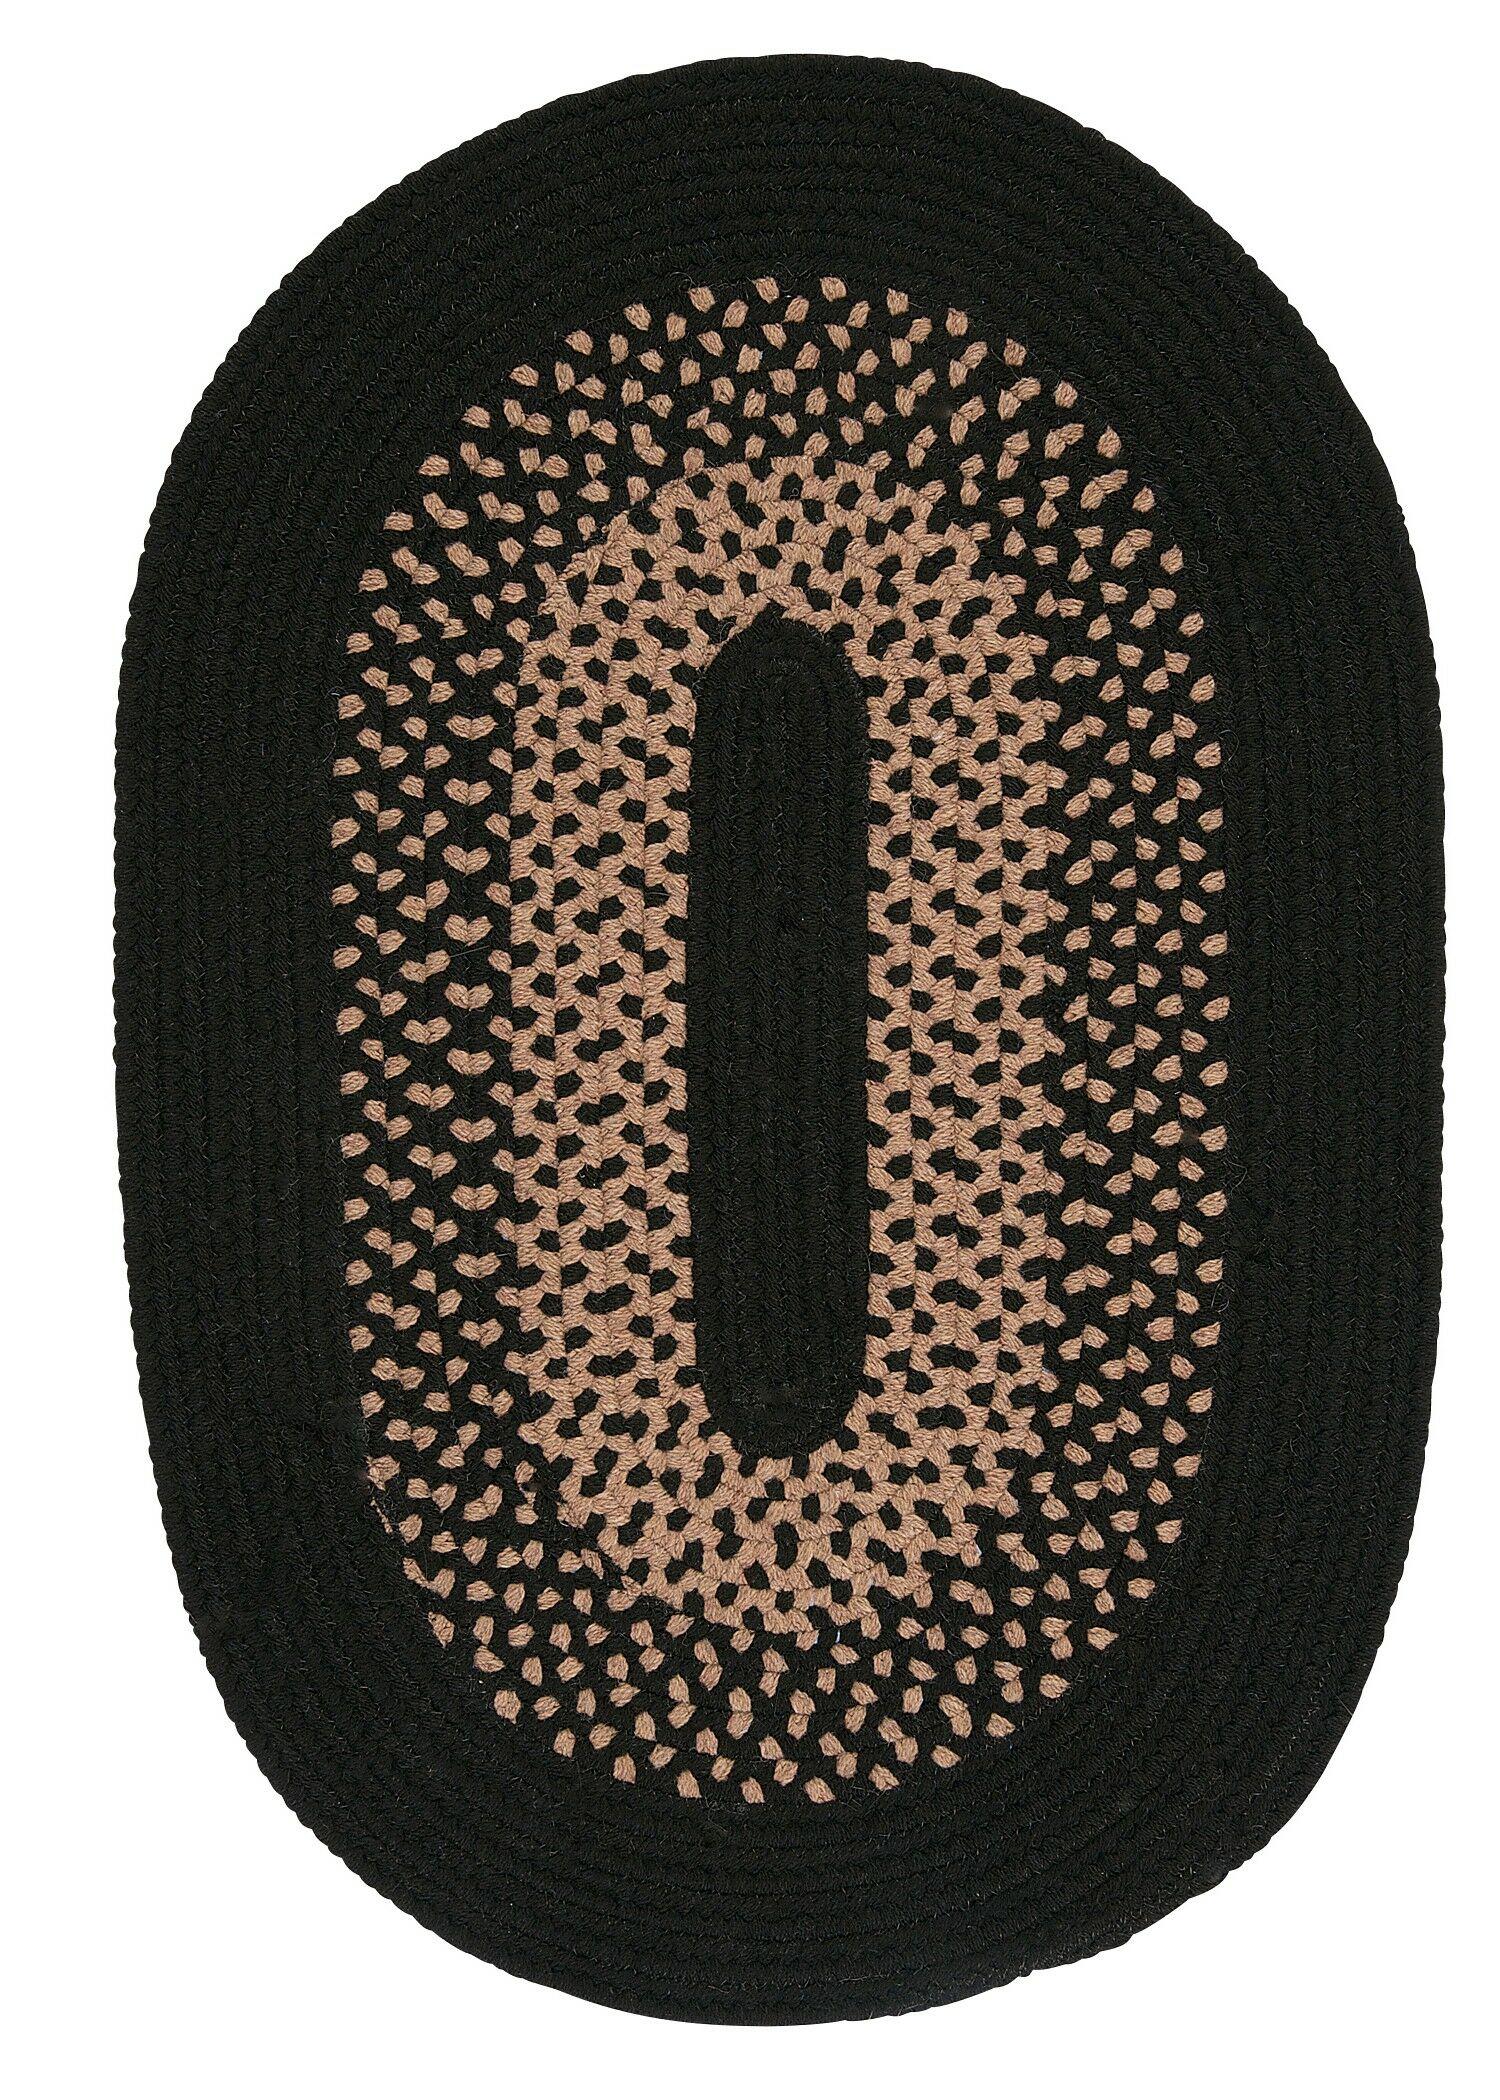 Lionel Jet Black Area Rug Rug Size: Round 8'